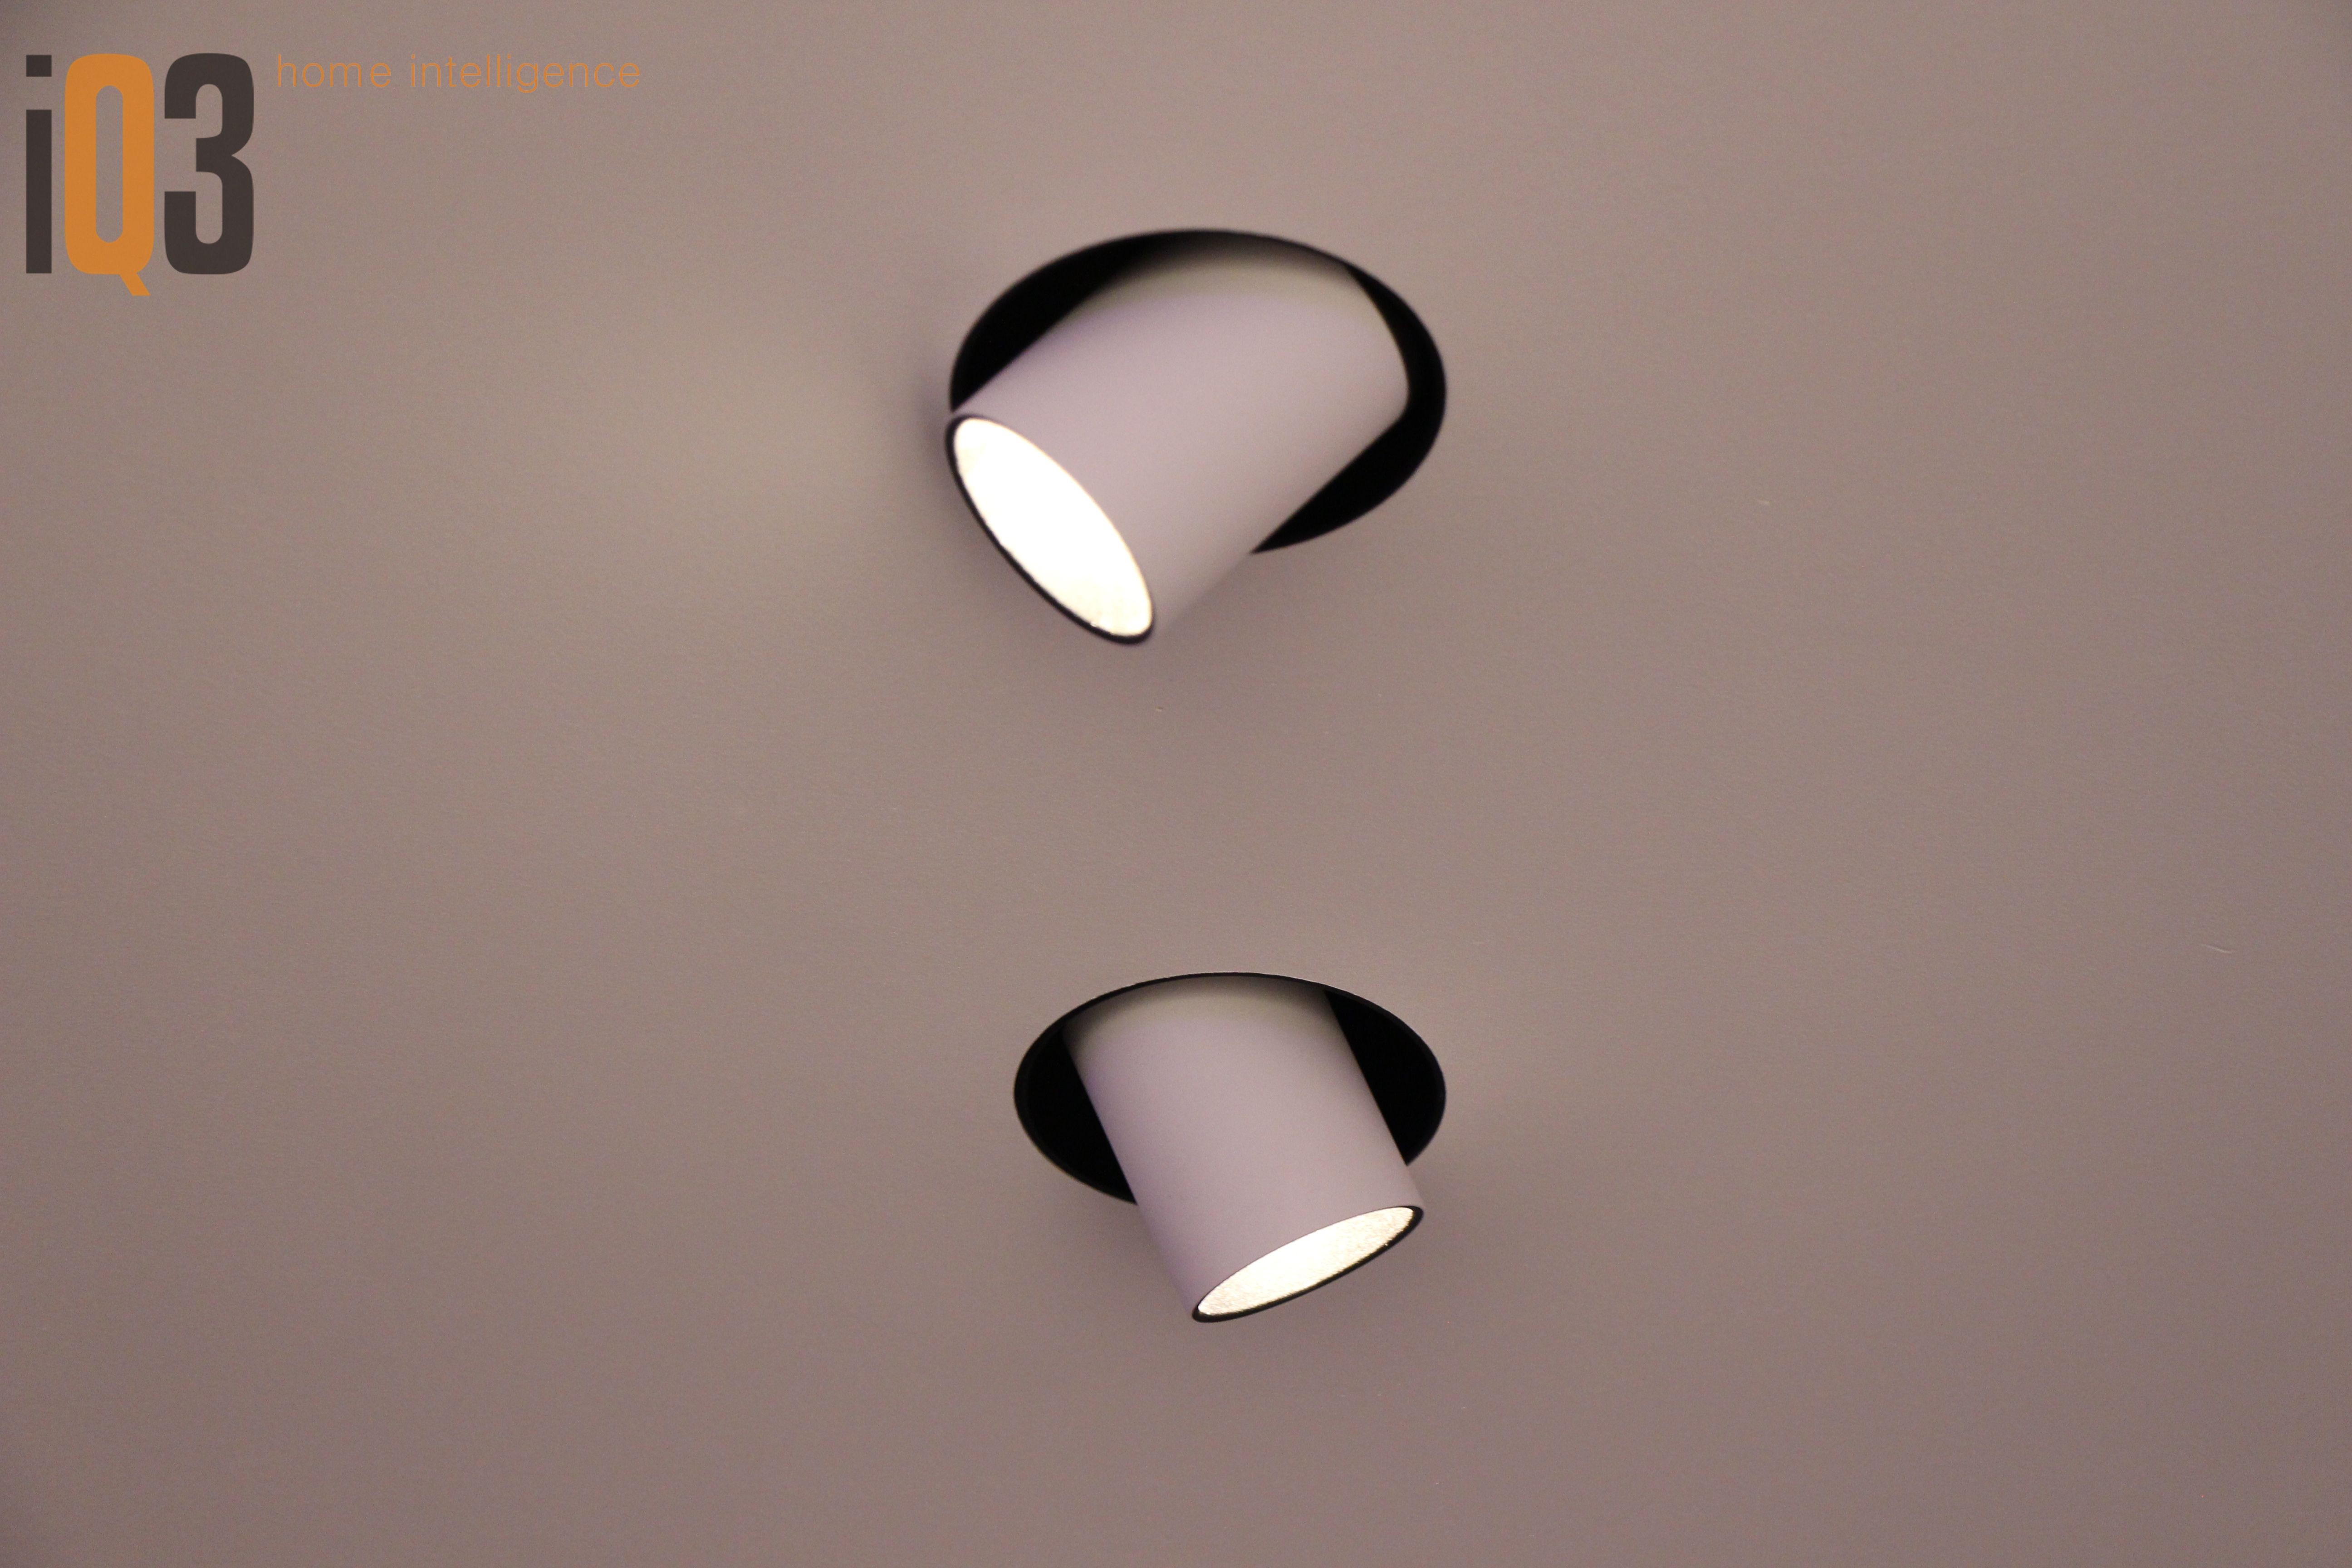 Licht Spots Inbouw : Inbouw spot deltalight ecosia